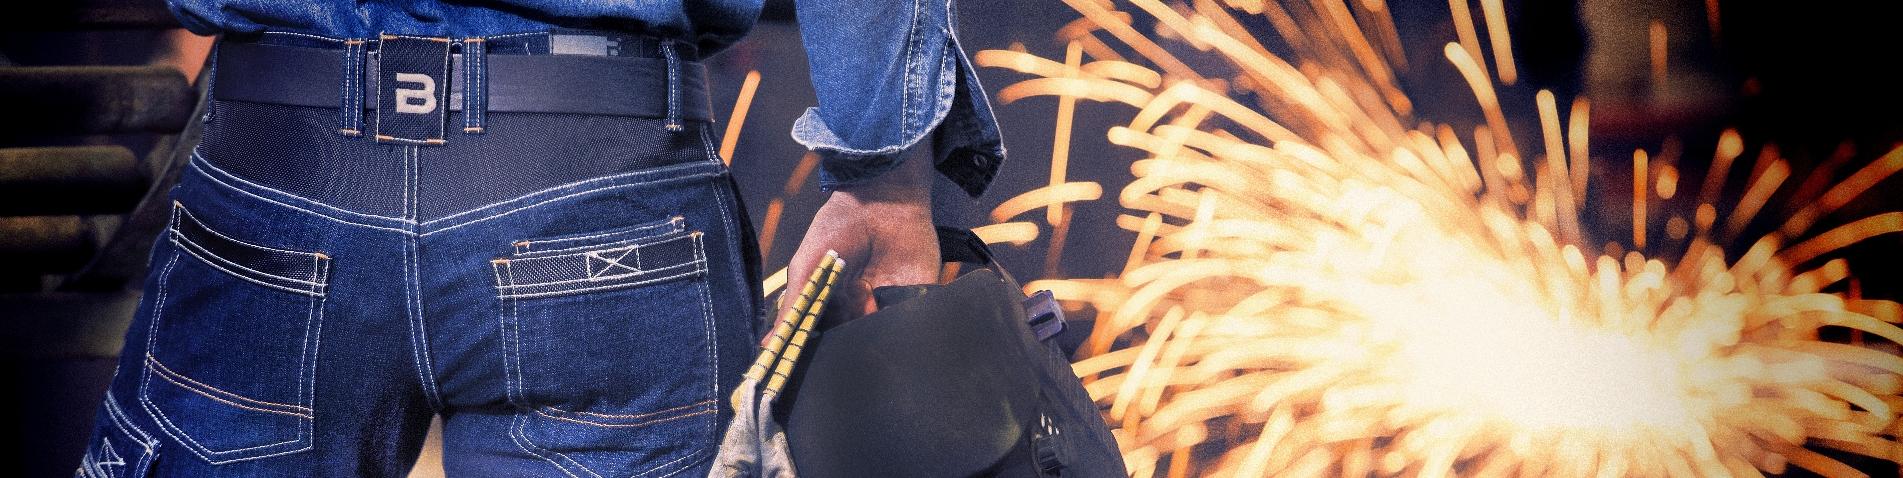 Jeans Werkbroeken banner breed